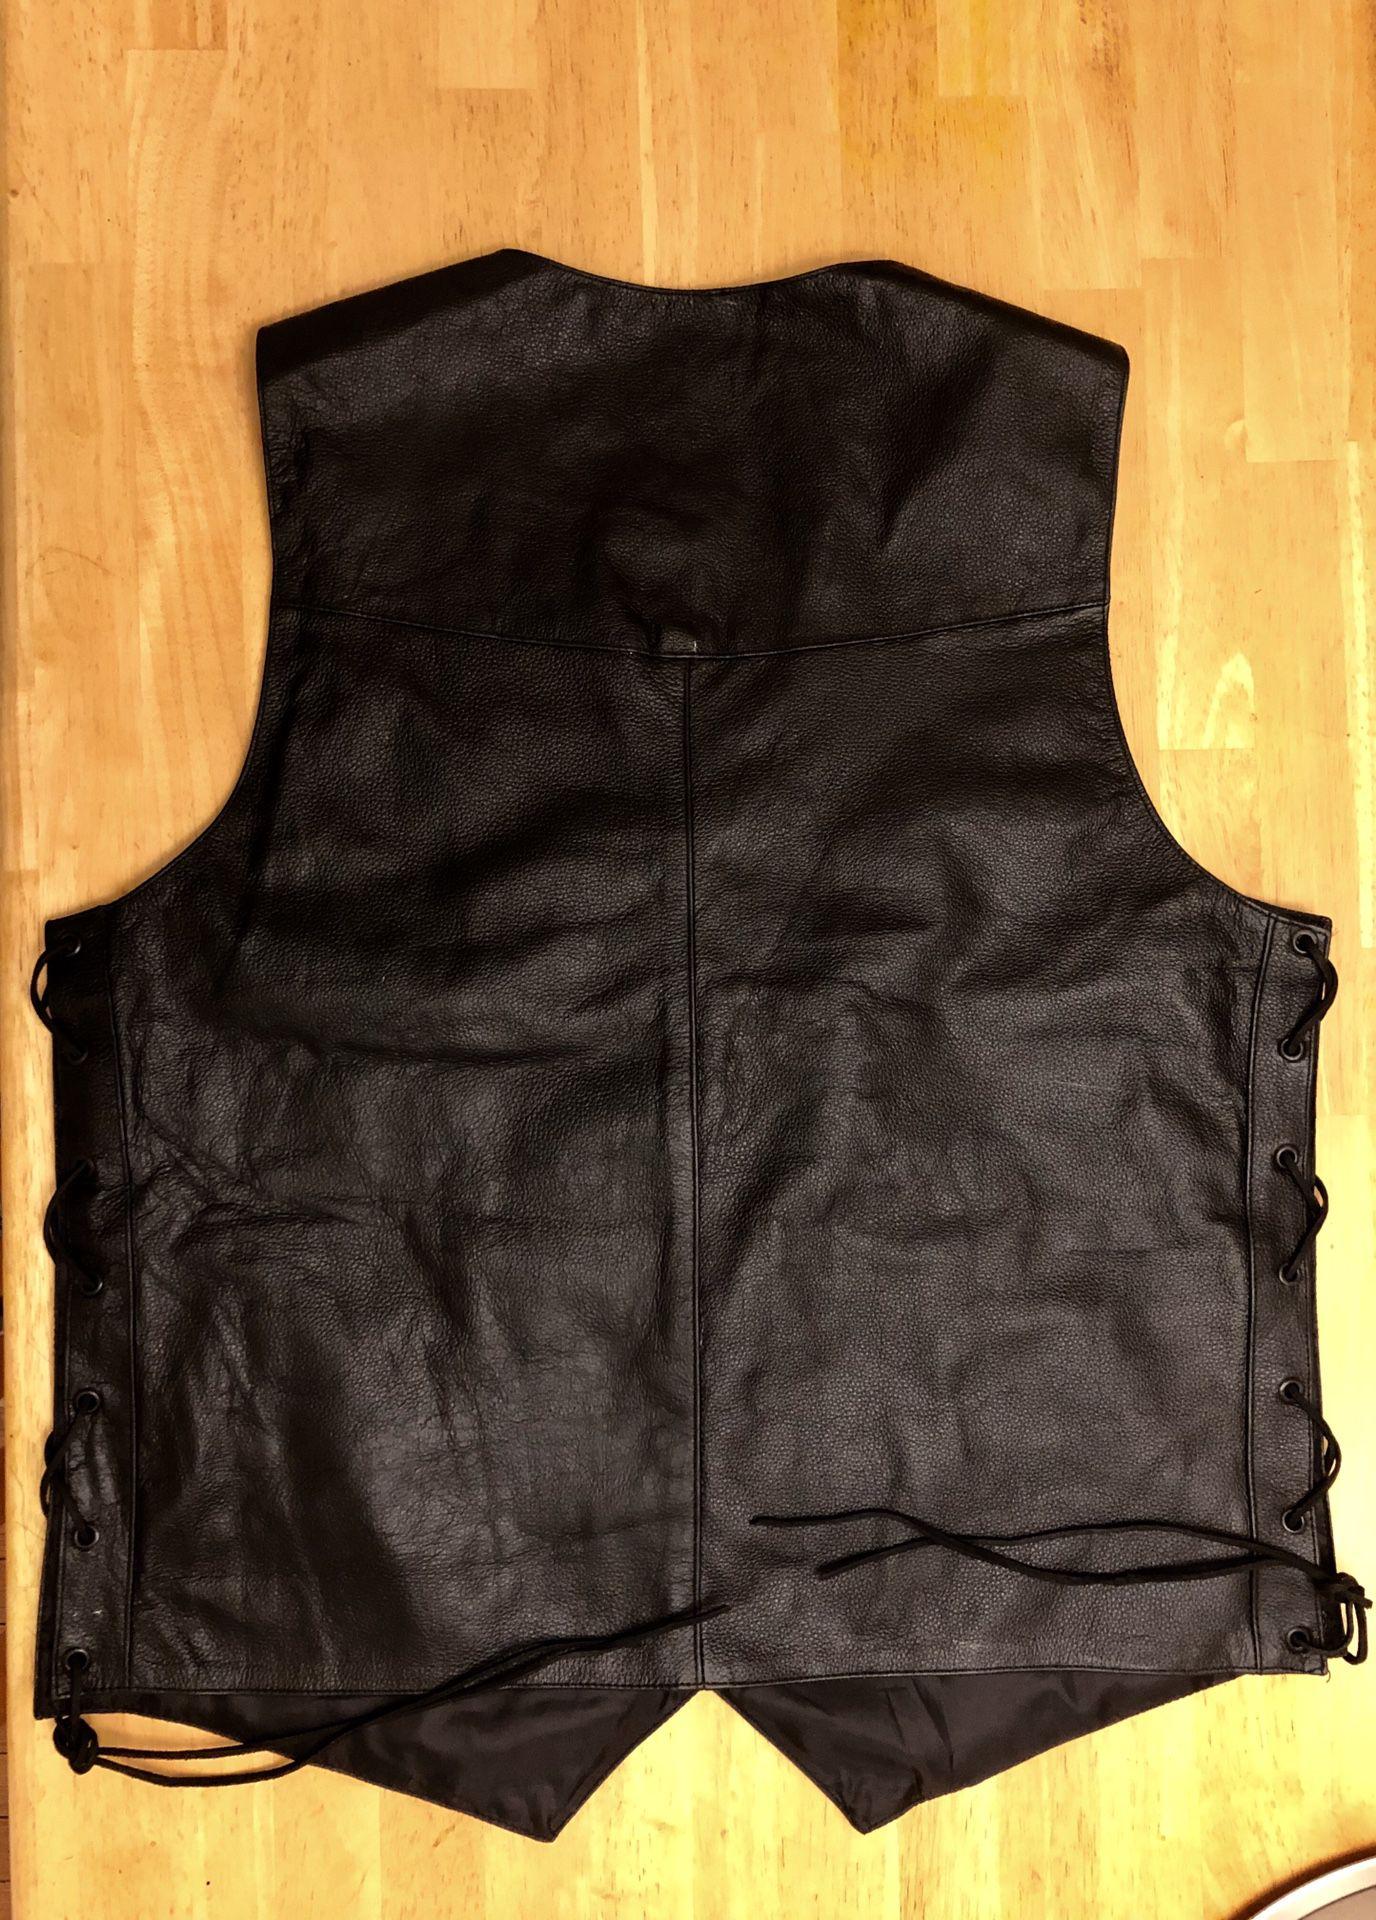 Motorcycle jacket club vest .vest